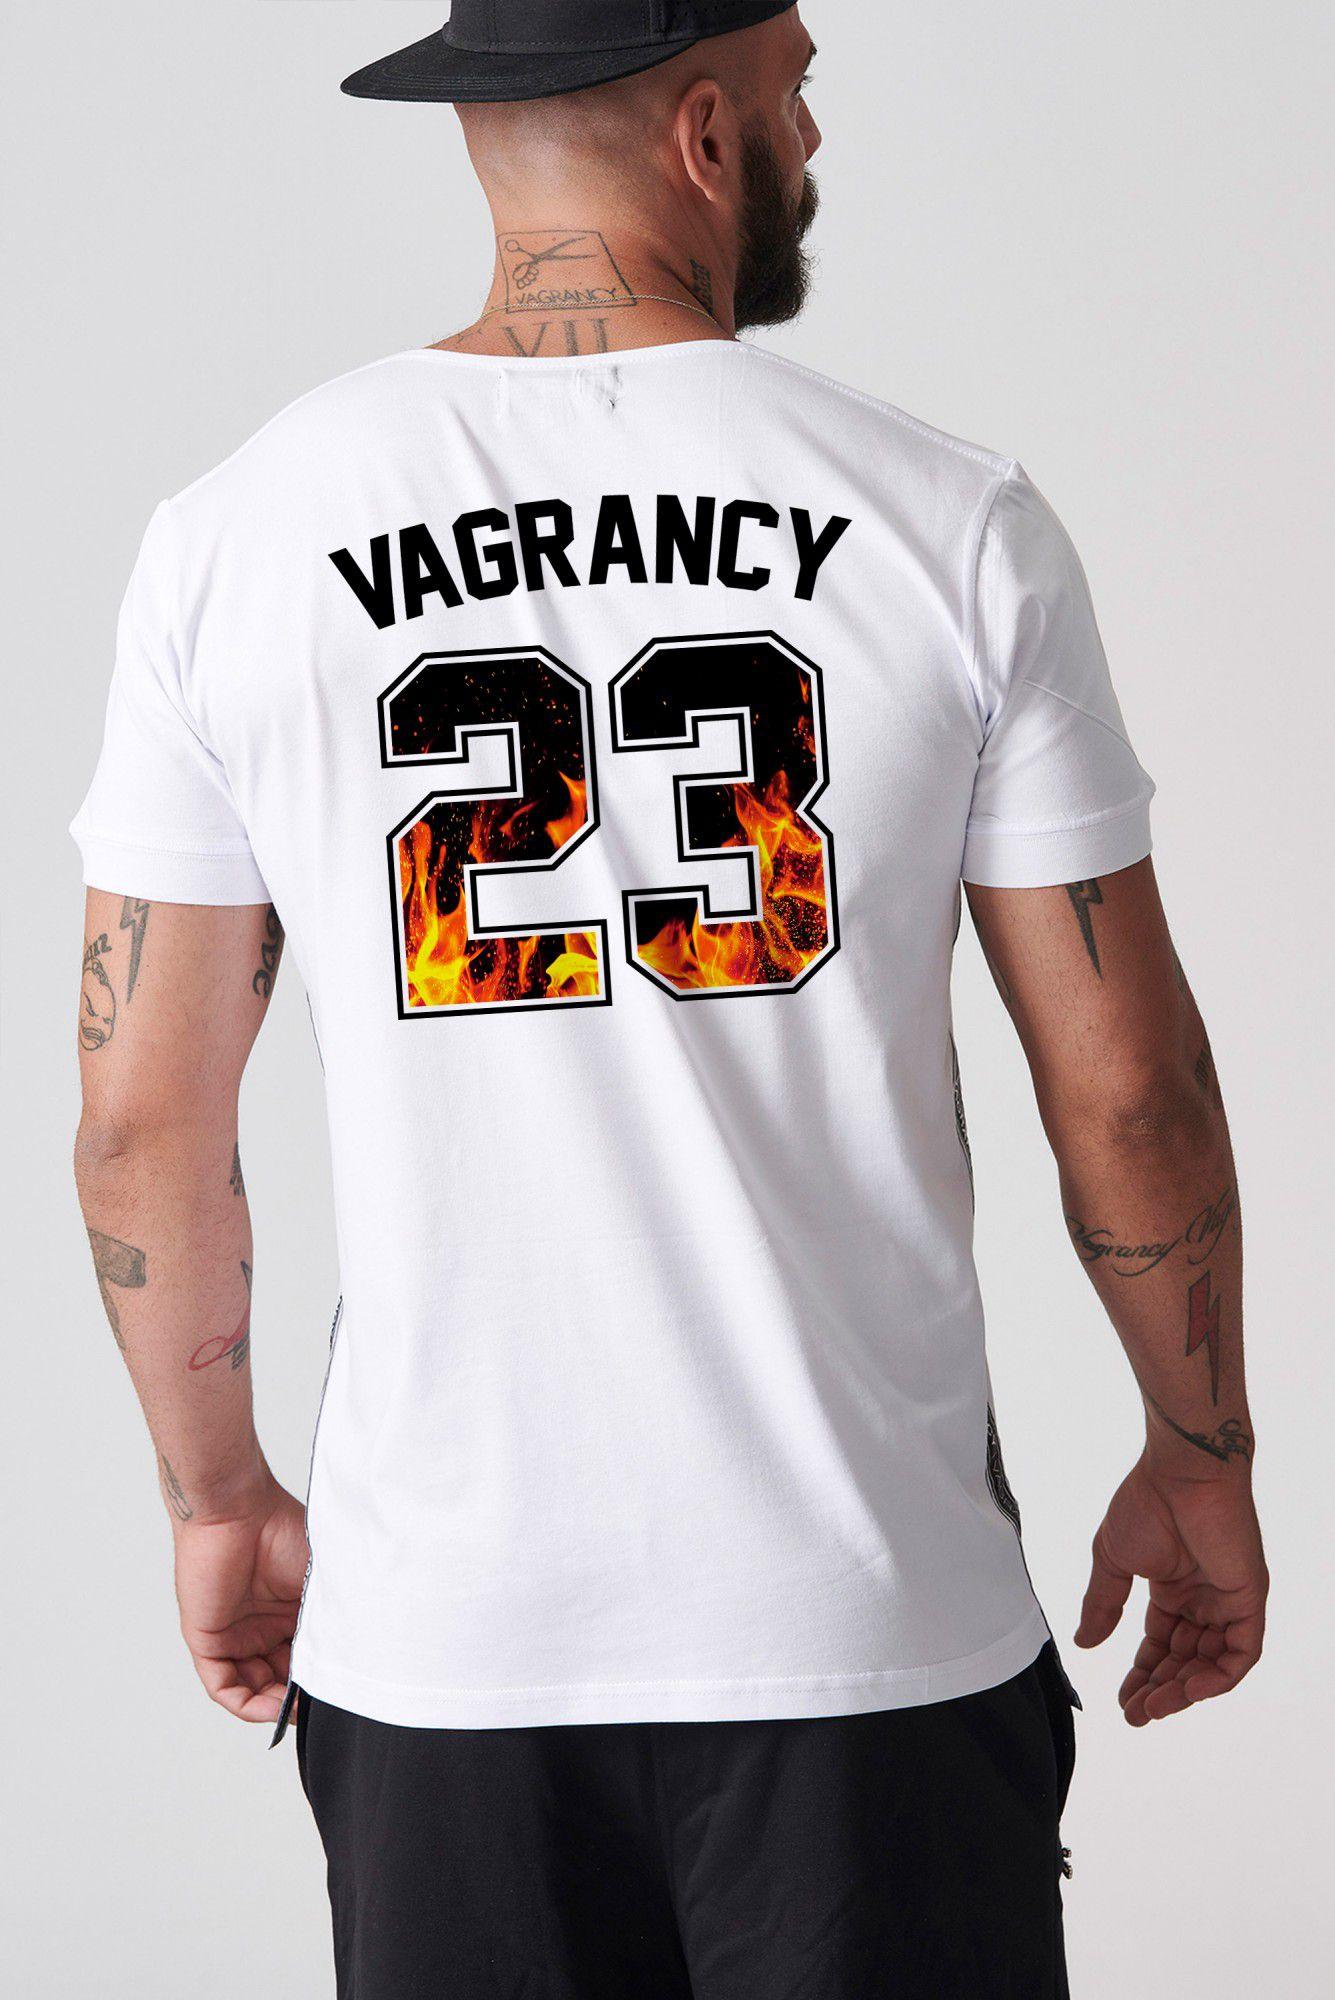 23 Vagrancy T-shirt